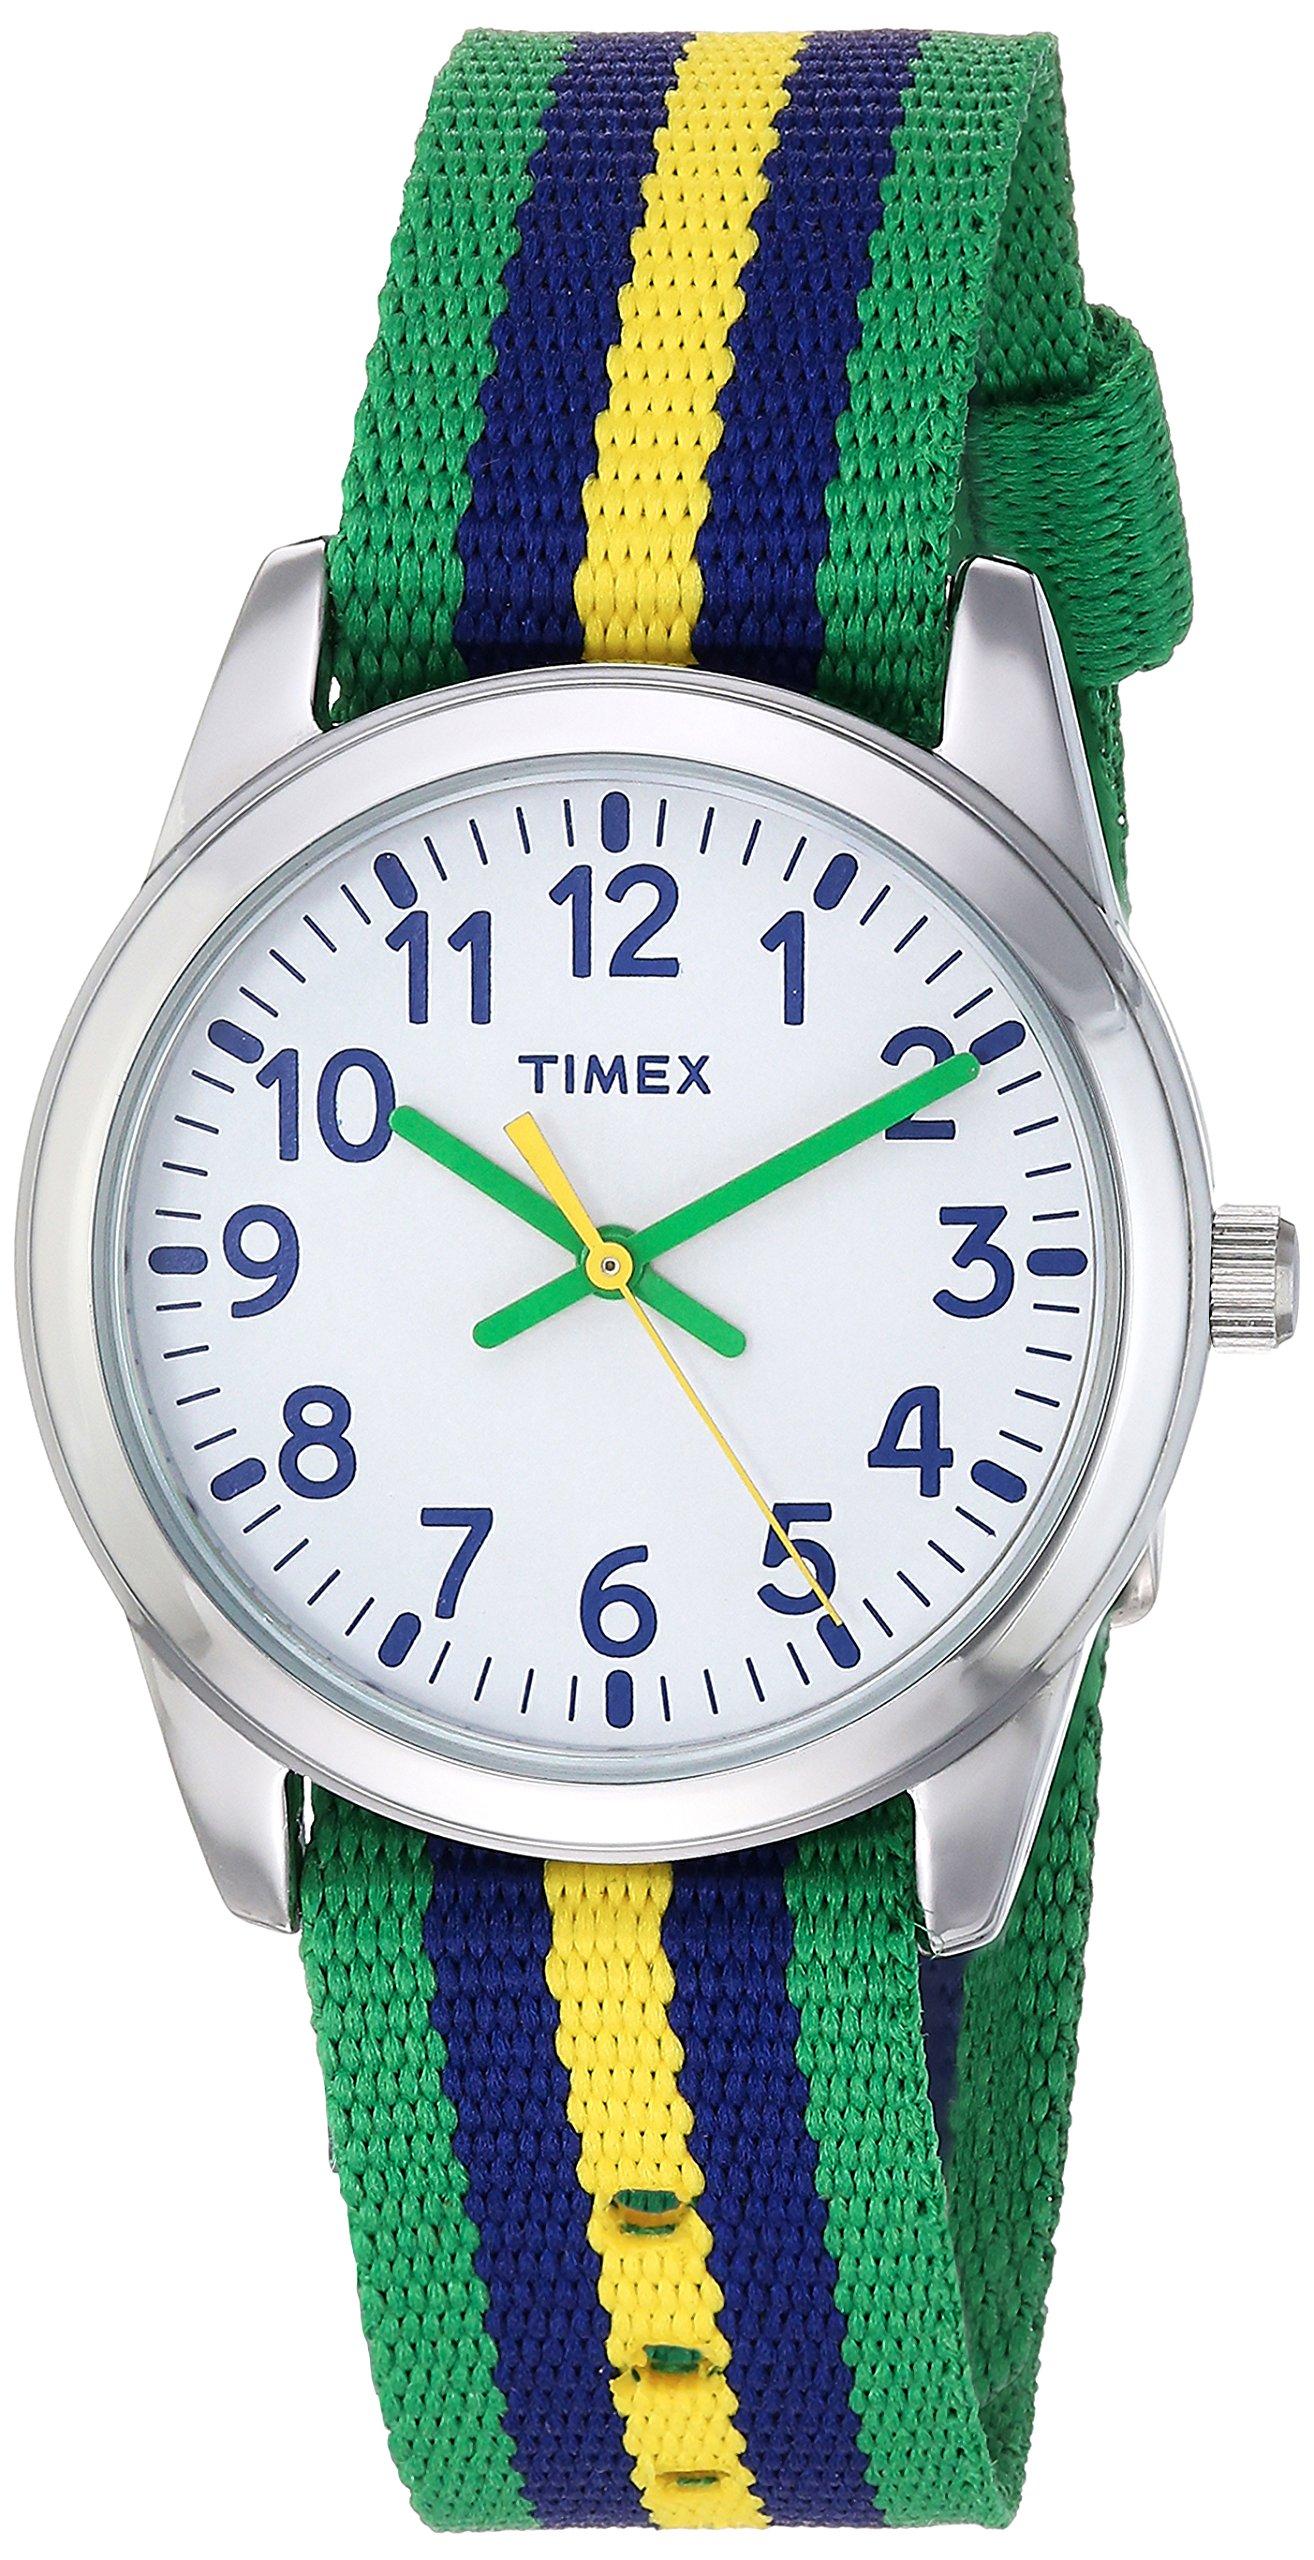 Timex Boys TW7C10100 Time Machines Metal Green/Blue/Yellow Stripes Nylon Strap Watch